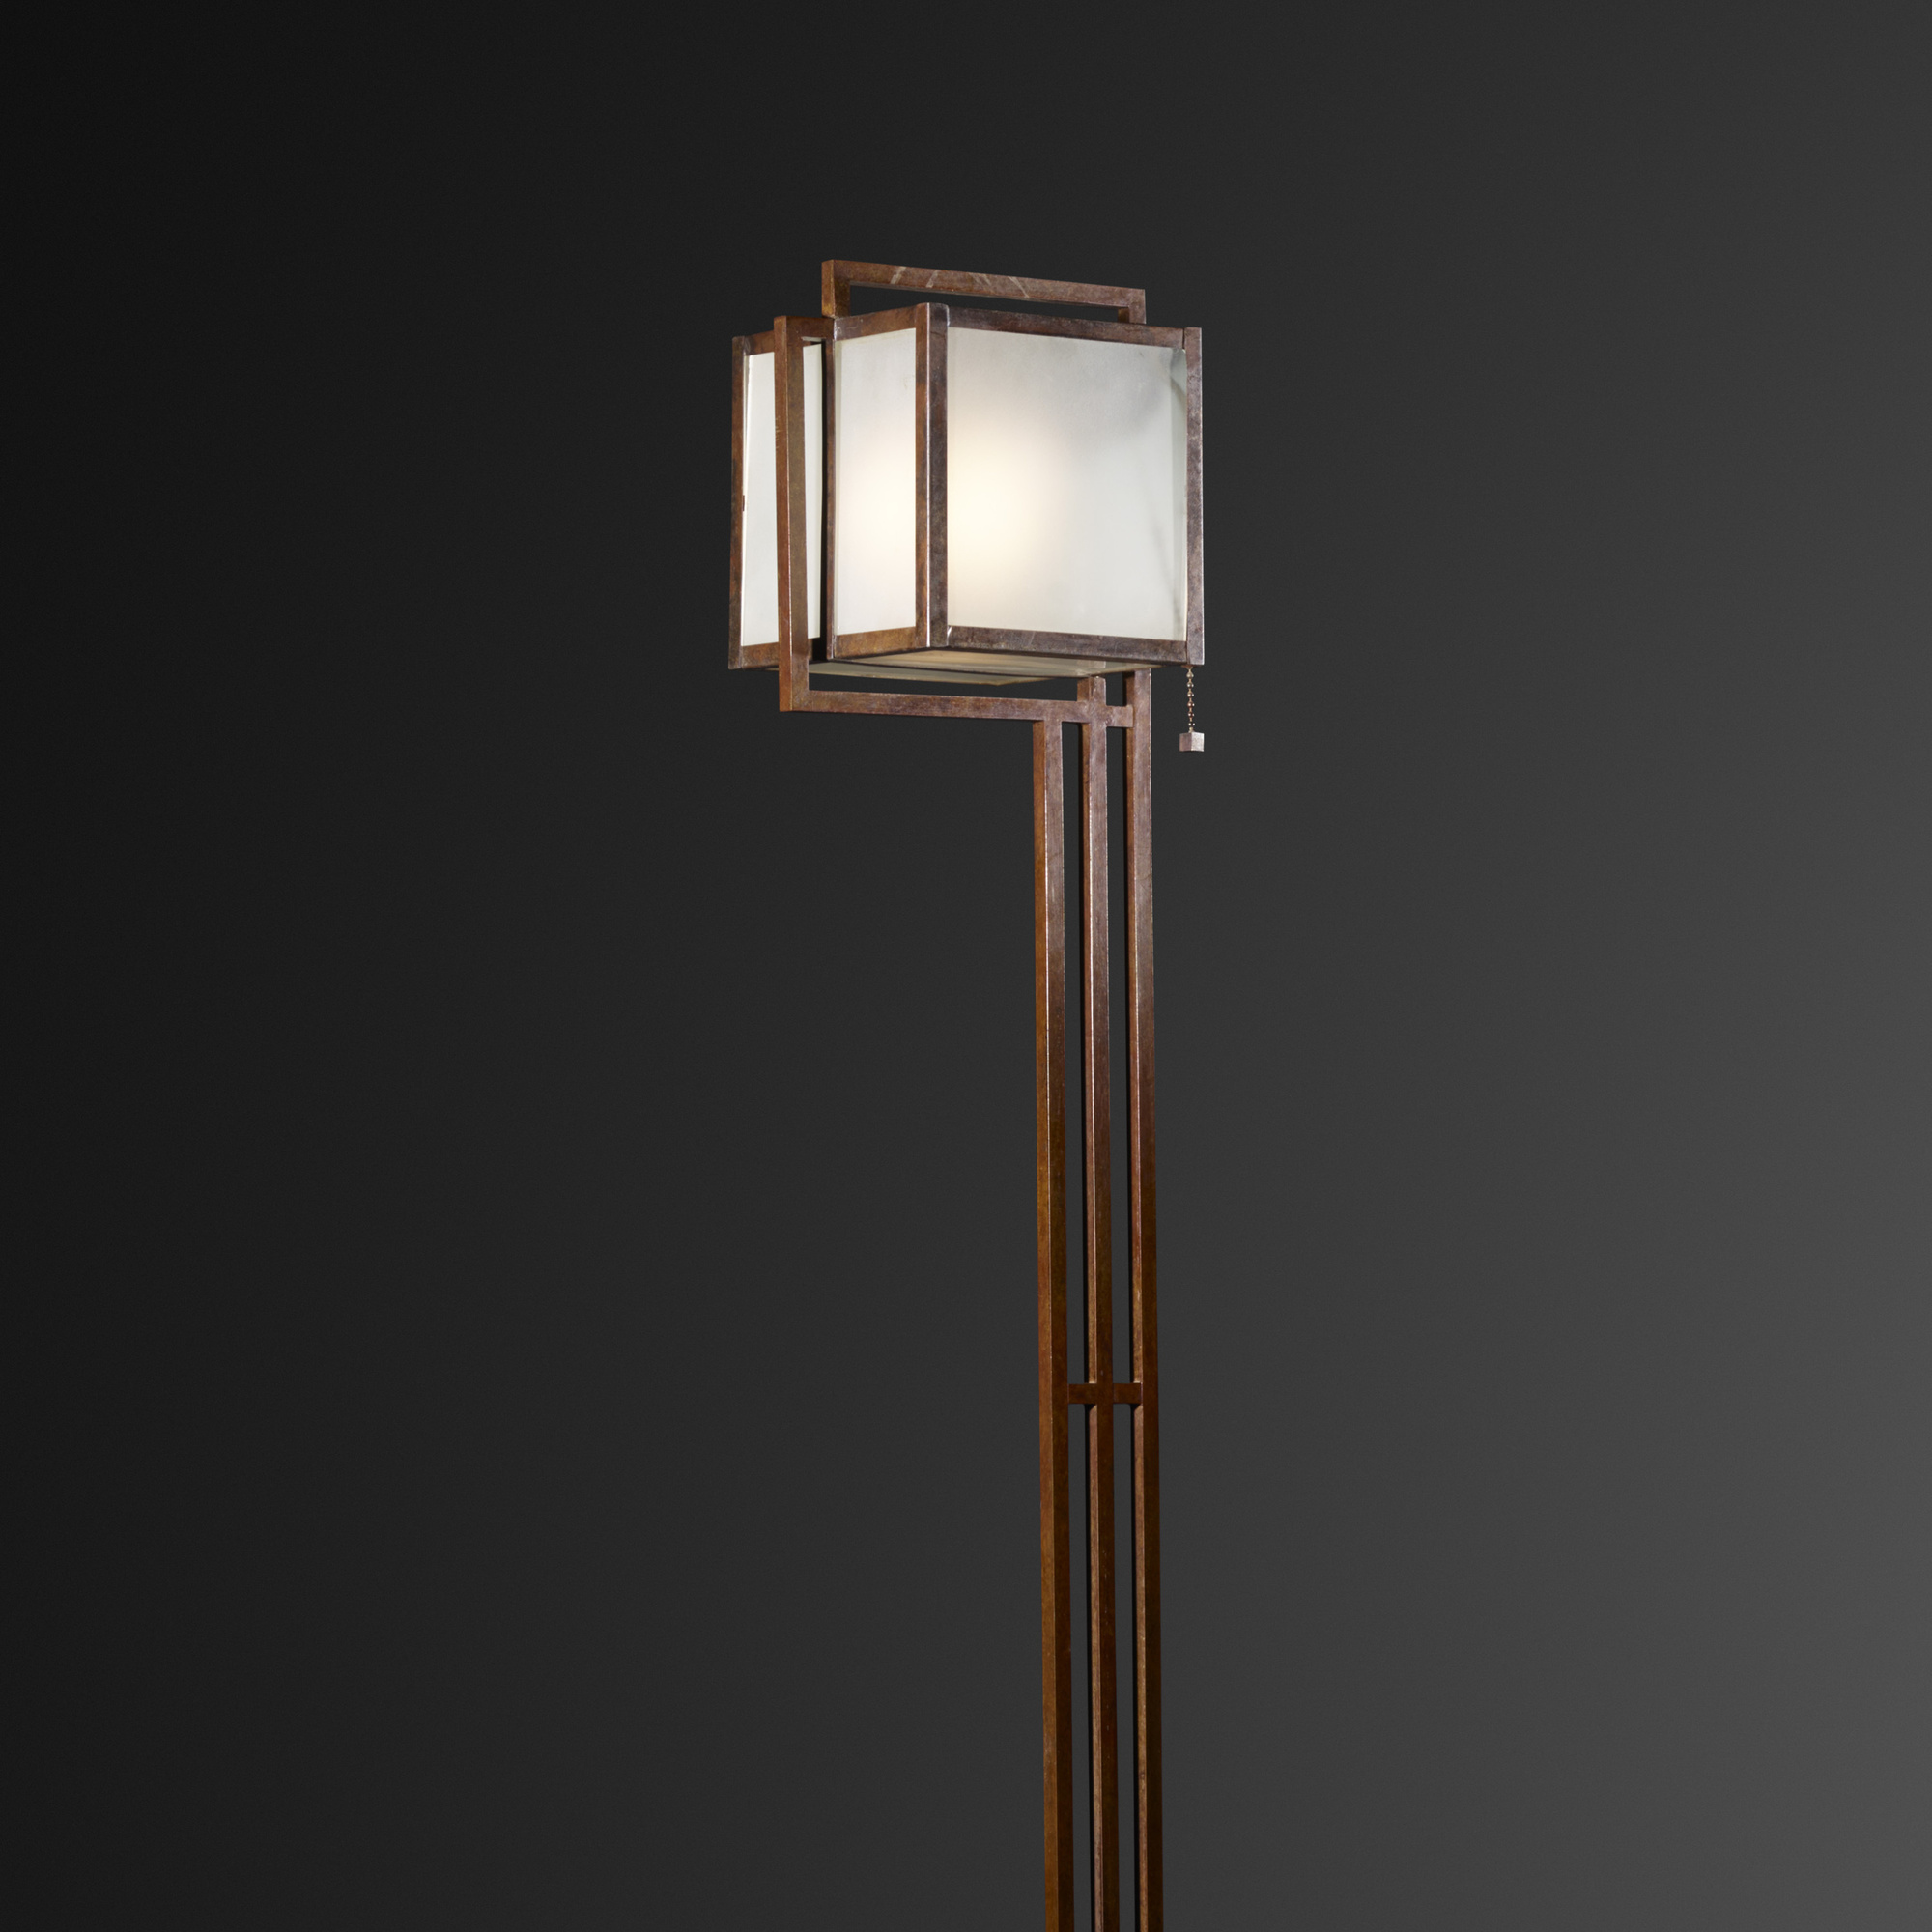 Frank Lloyd Wright Flooring : Frank lloyd wright rare floor lamp from the john